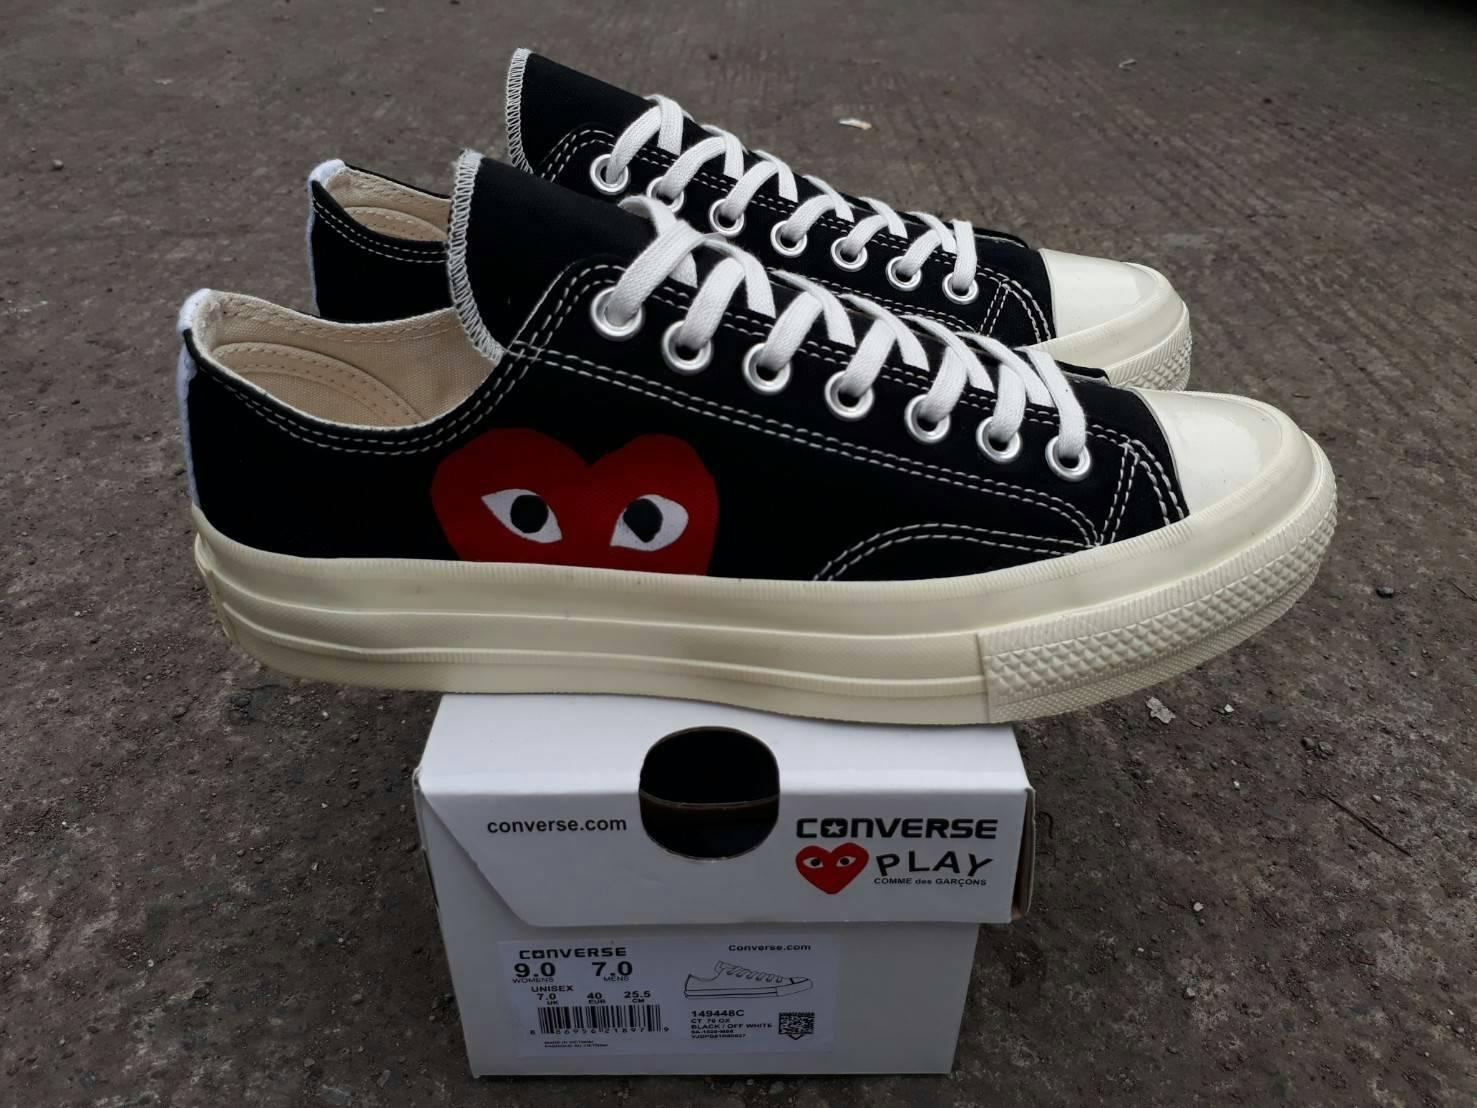 sepatu converse low CDG black white premium BNIB made in vietnam